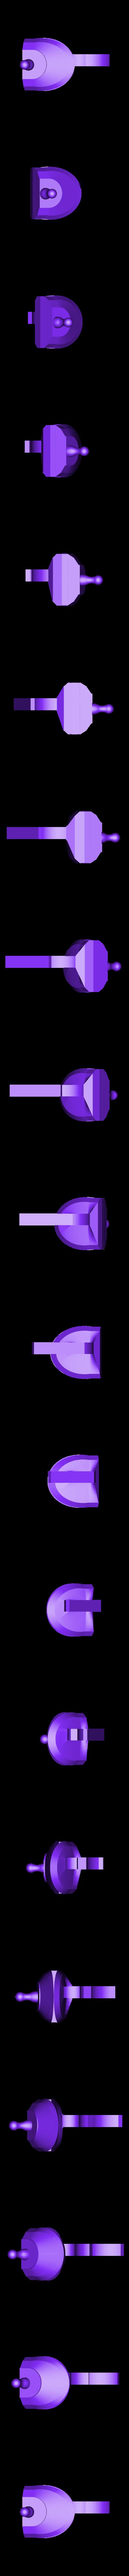 3_DuckfootGun_Striker.stl Download free STL file Duck's foot gun • Object to 3D print, Snorri